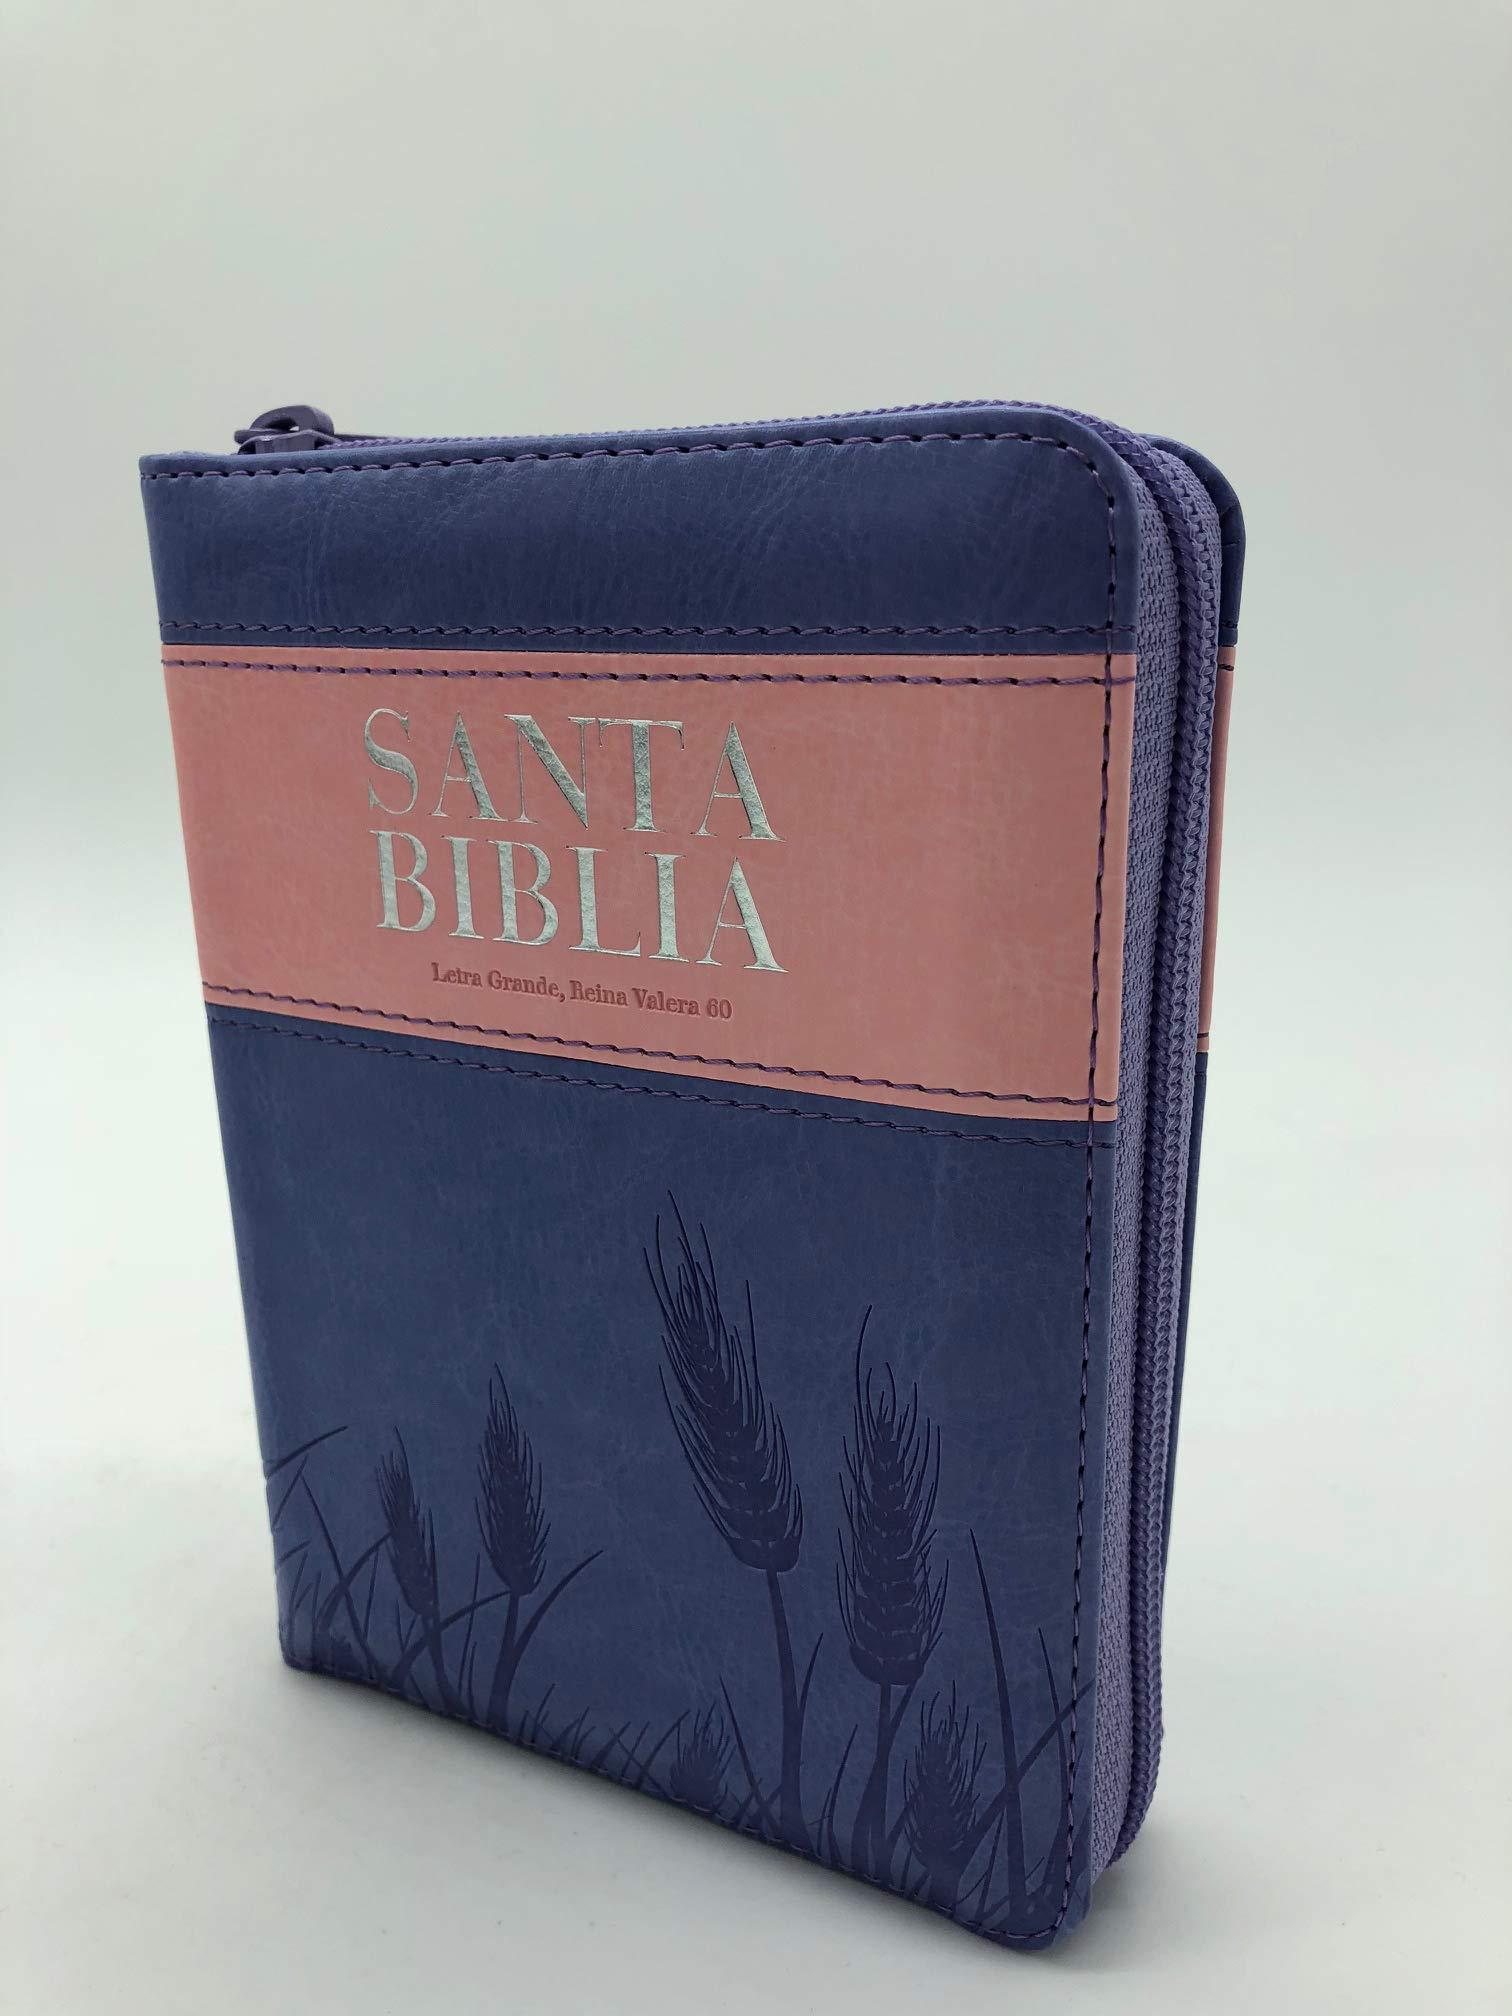 Biblia Reina Valera 1960 / Tama�o bolsillo / con cierre / �ndice / Rosa Violeta>